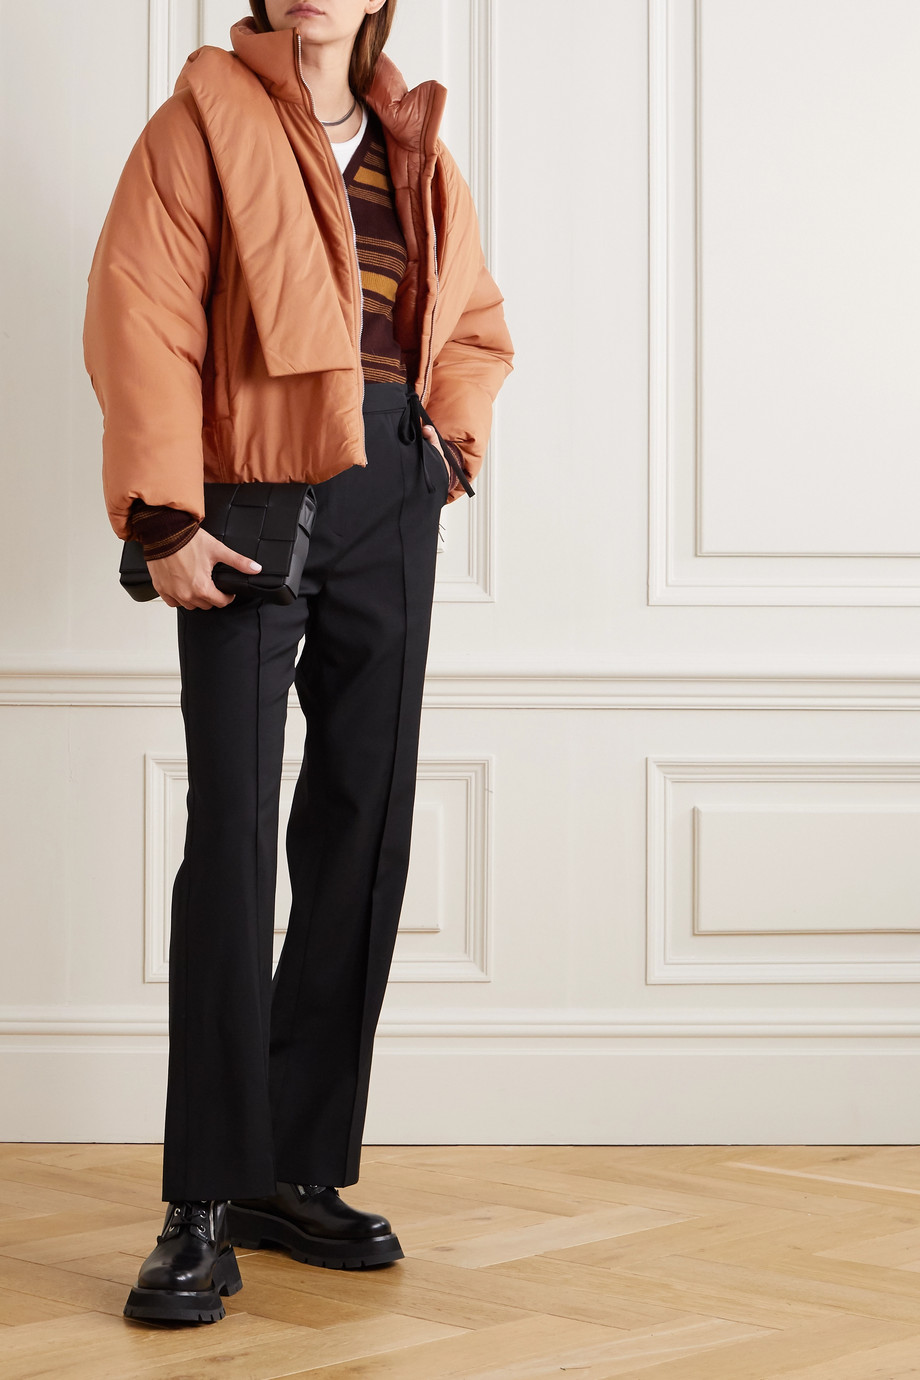 3.1 Phillip Lim 系带细节带填充物棉质混纺软壳面料连帽夹克